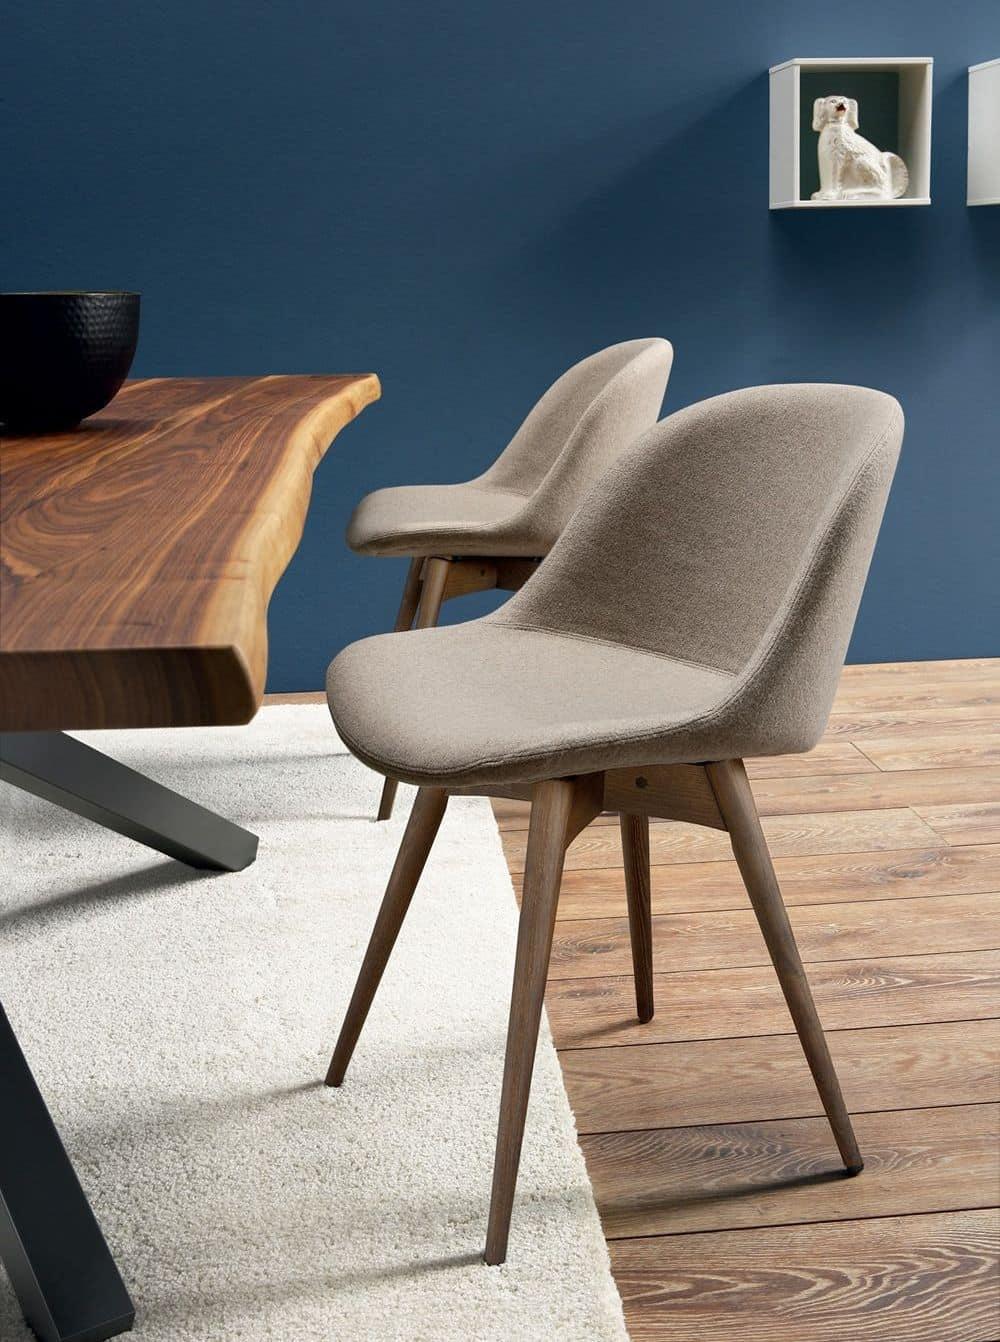 Sedia in legno seduta rivestita in pelle o tessuto for Sedie design outlet